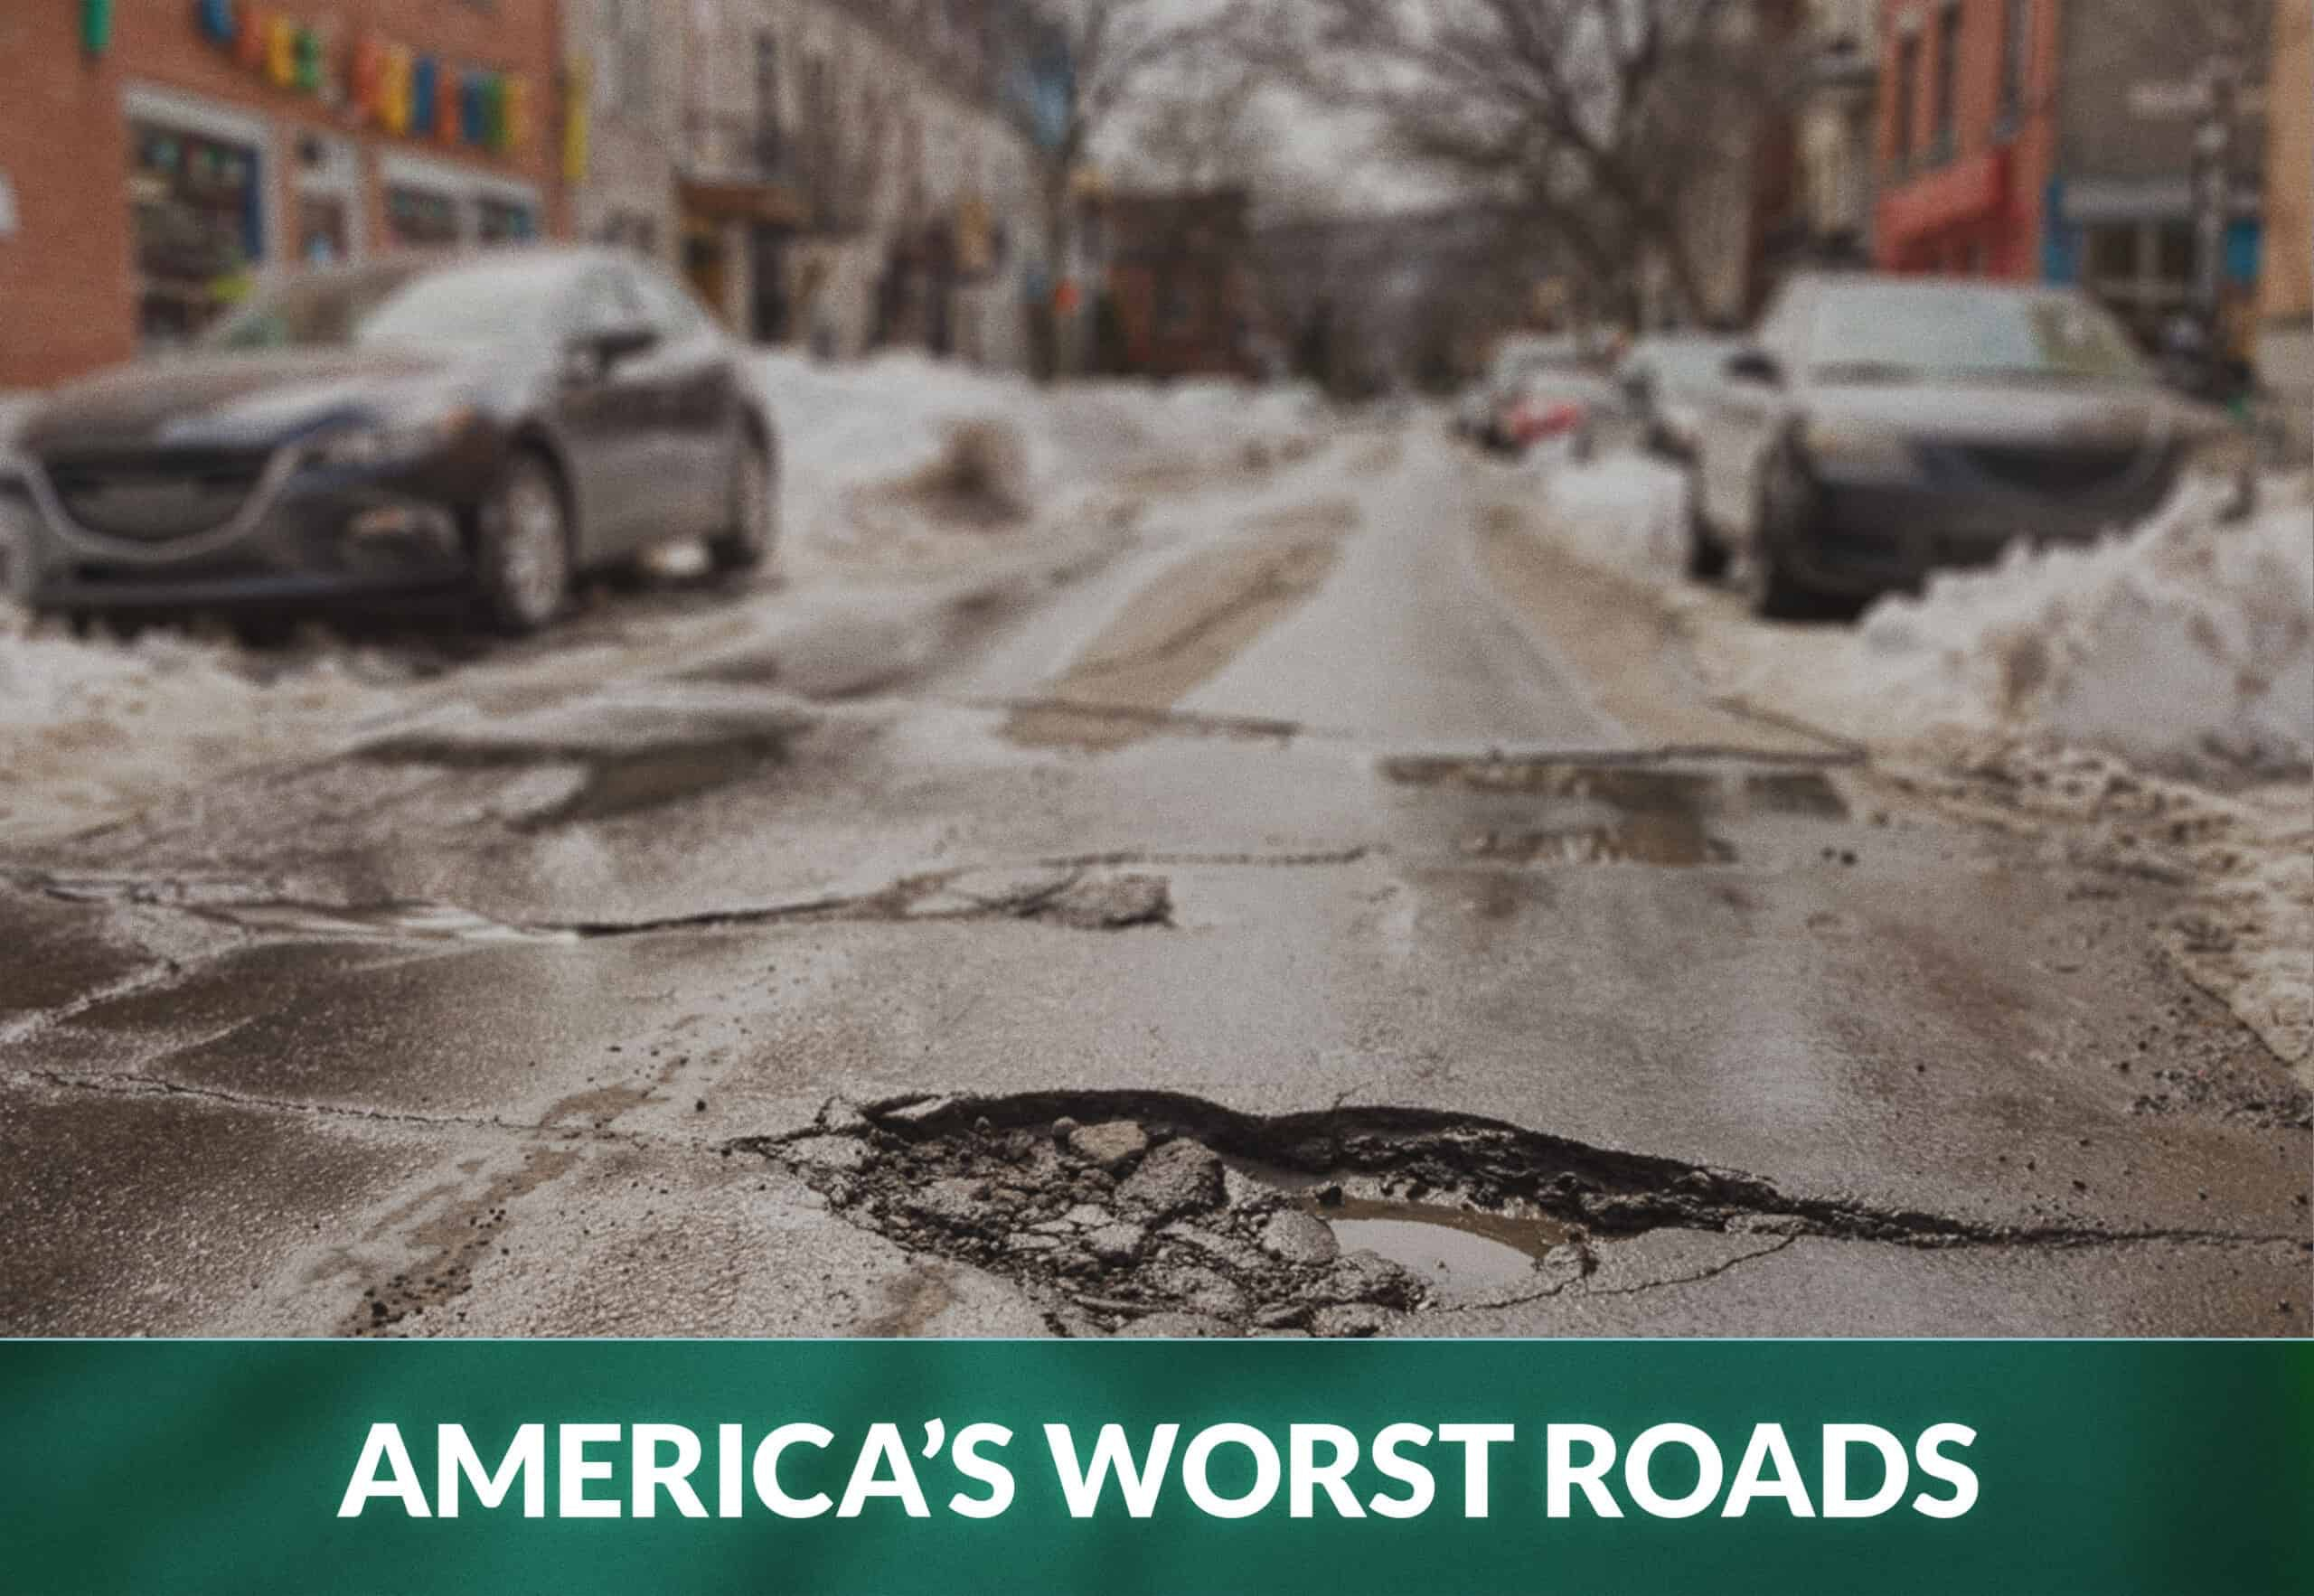 AMERICA'S WORST ROADS